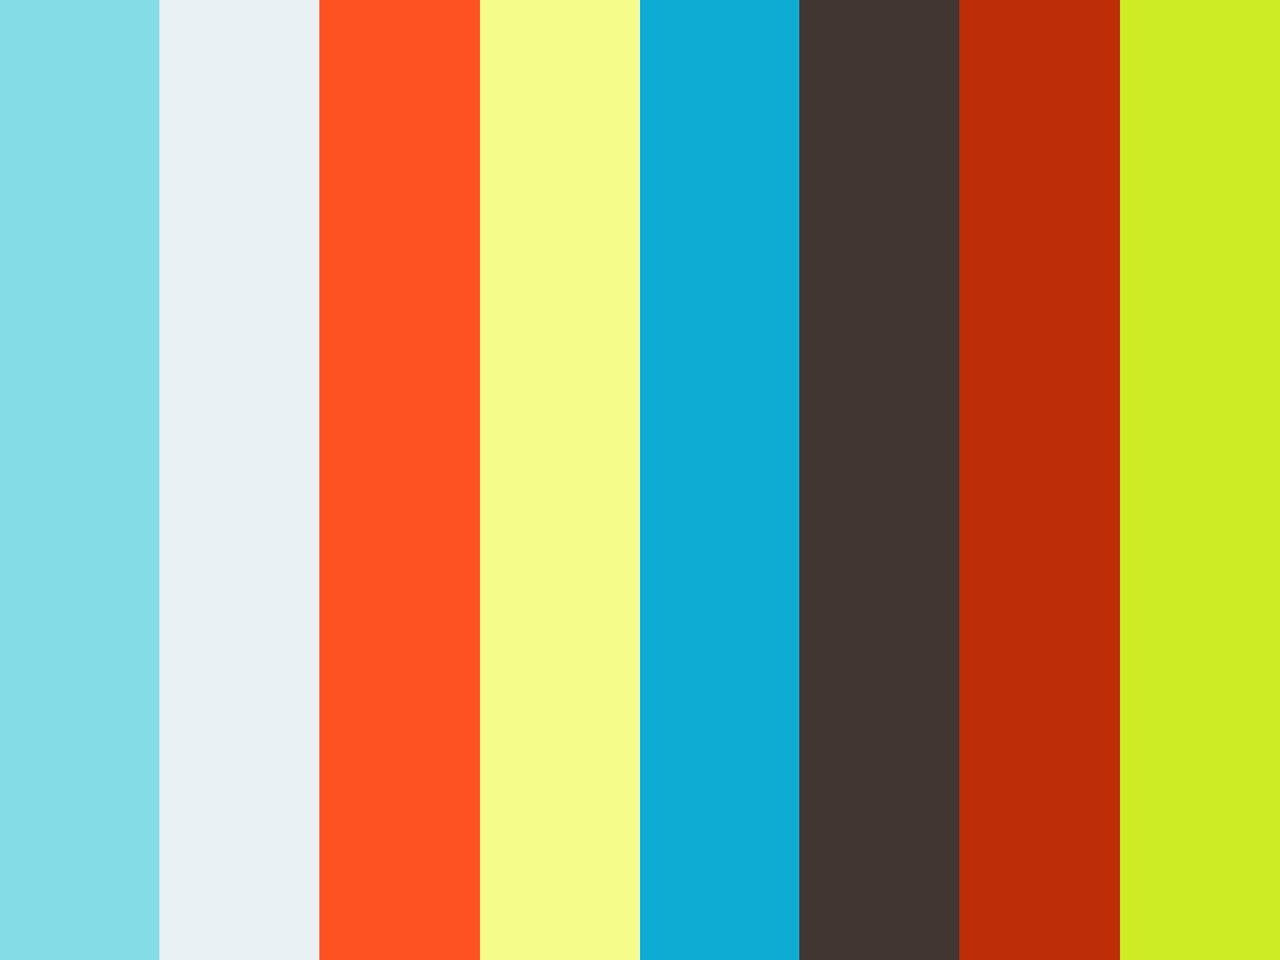 Molokai Covid19 Update - Friday, May 8, 2020